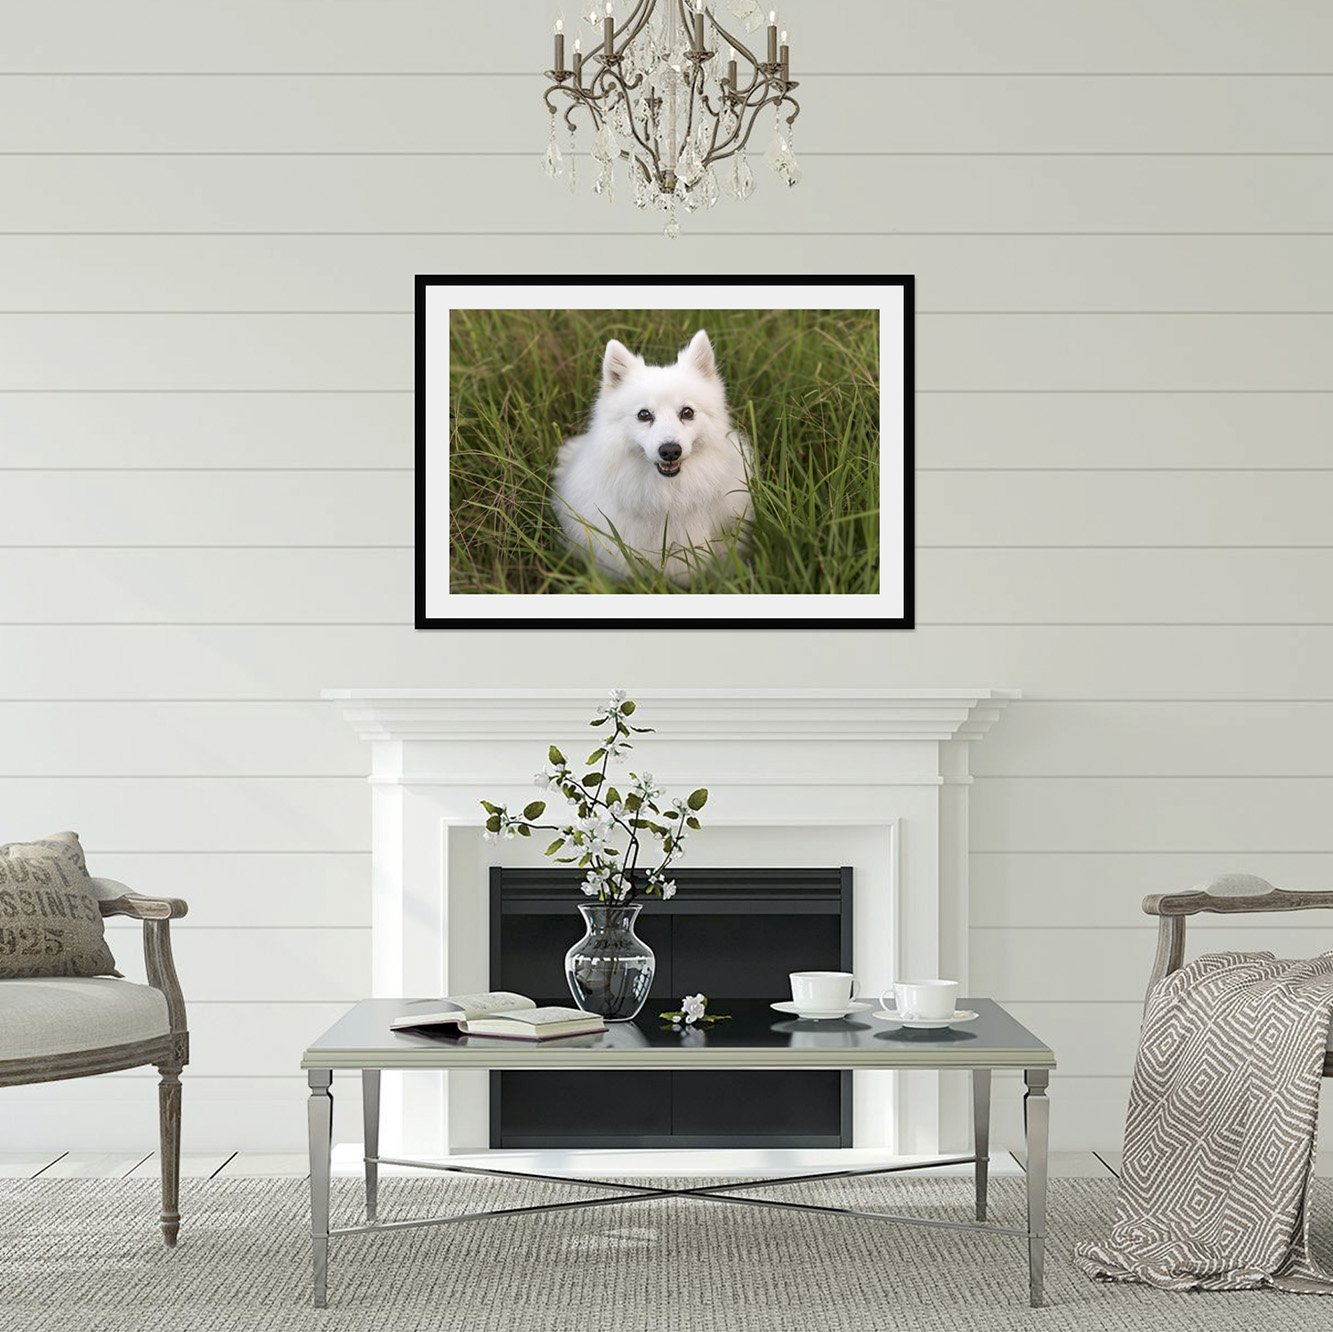 Saki on the wall as fine art